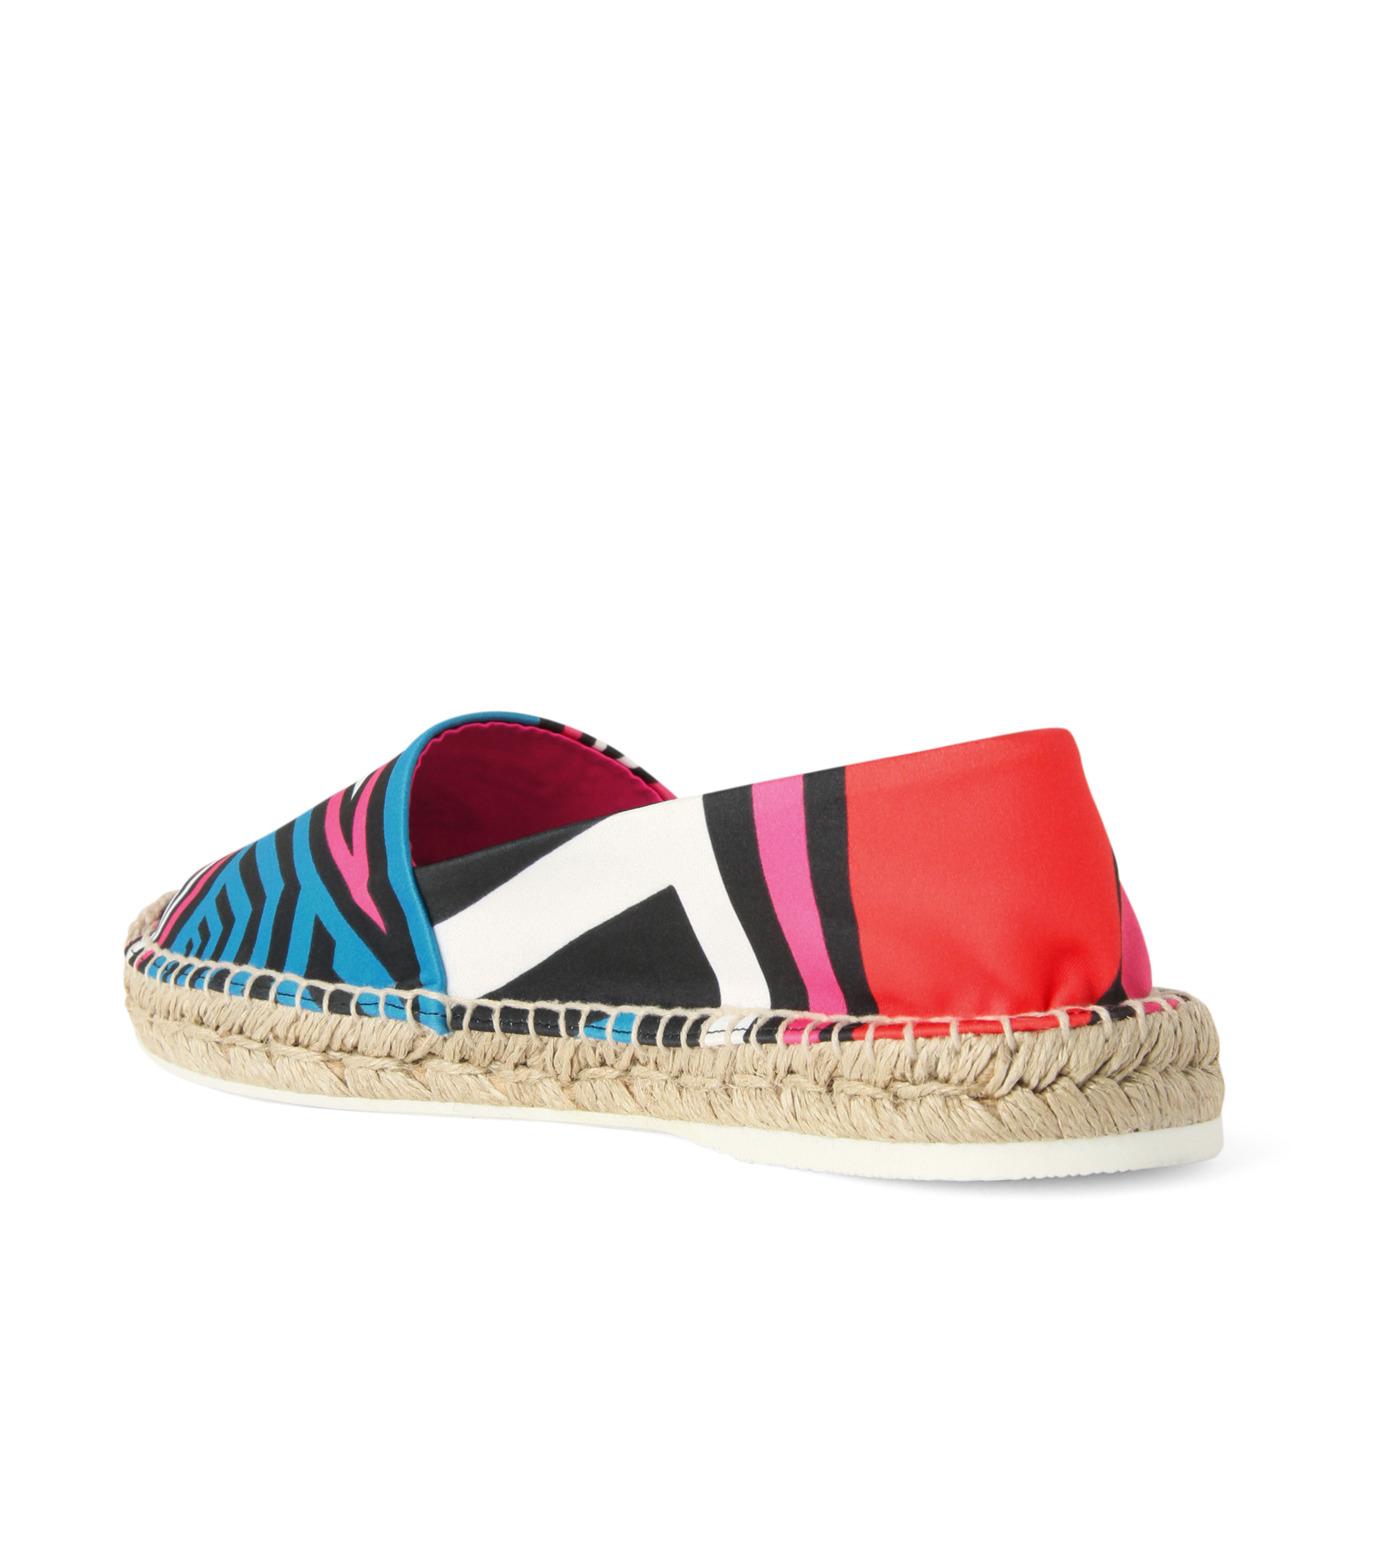 Nicholas  Kirkwood(ニコラス カークウッド)のEspadrille Loafer-MULTI COLOUR(シューズ/shoes)-15SF012-9 拡大詳細画像2